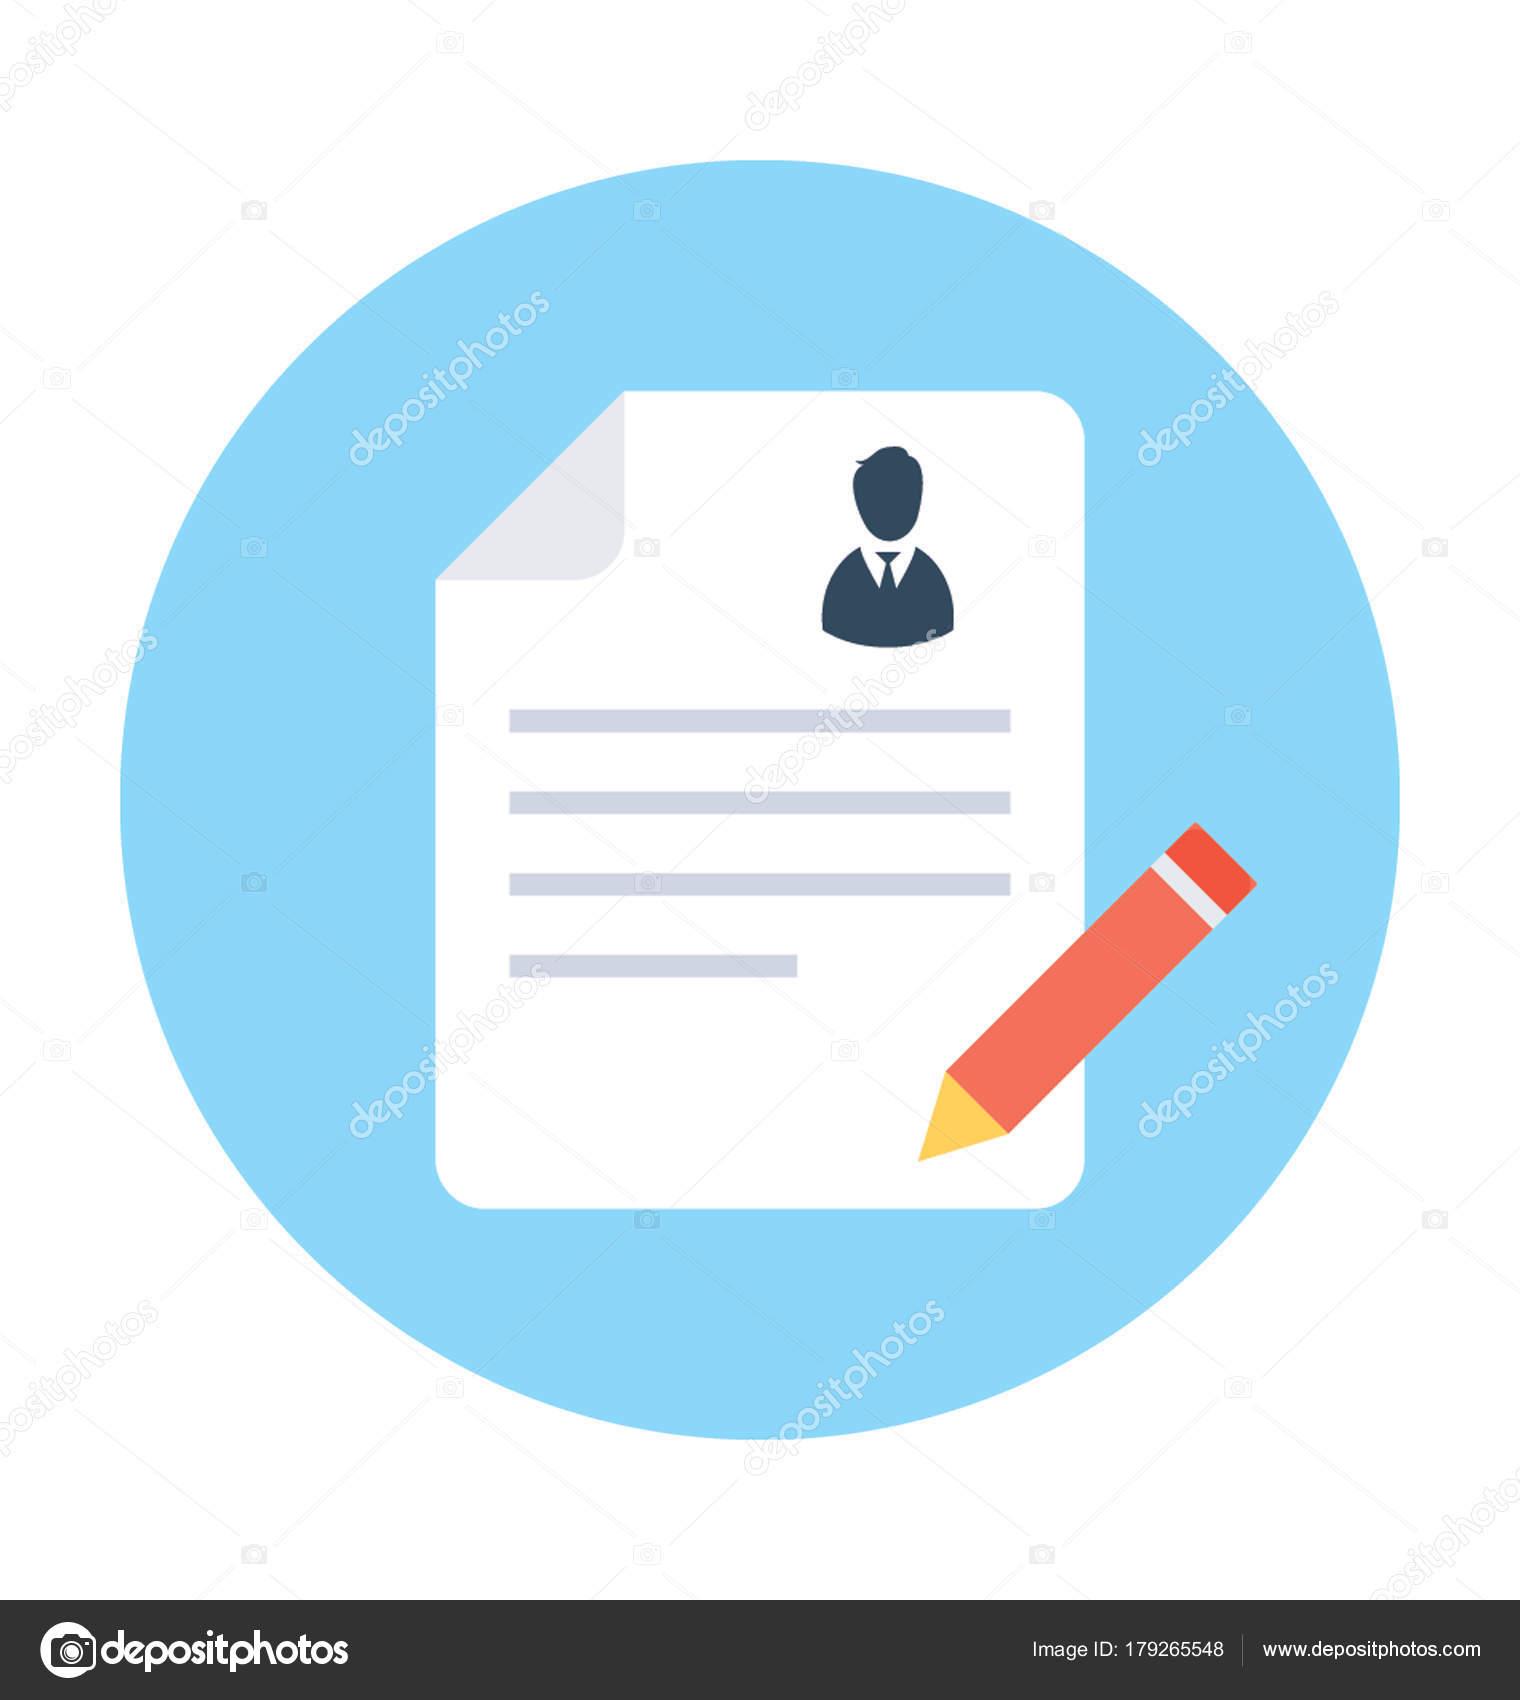 skills icon for resume